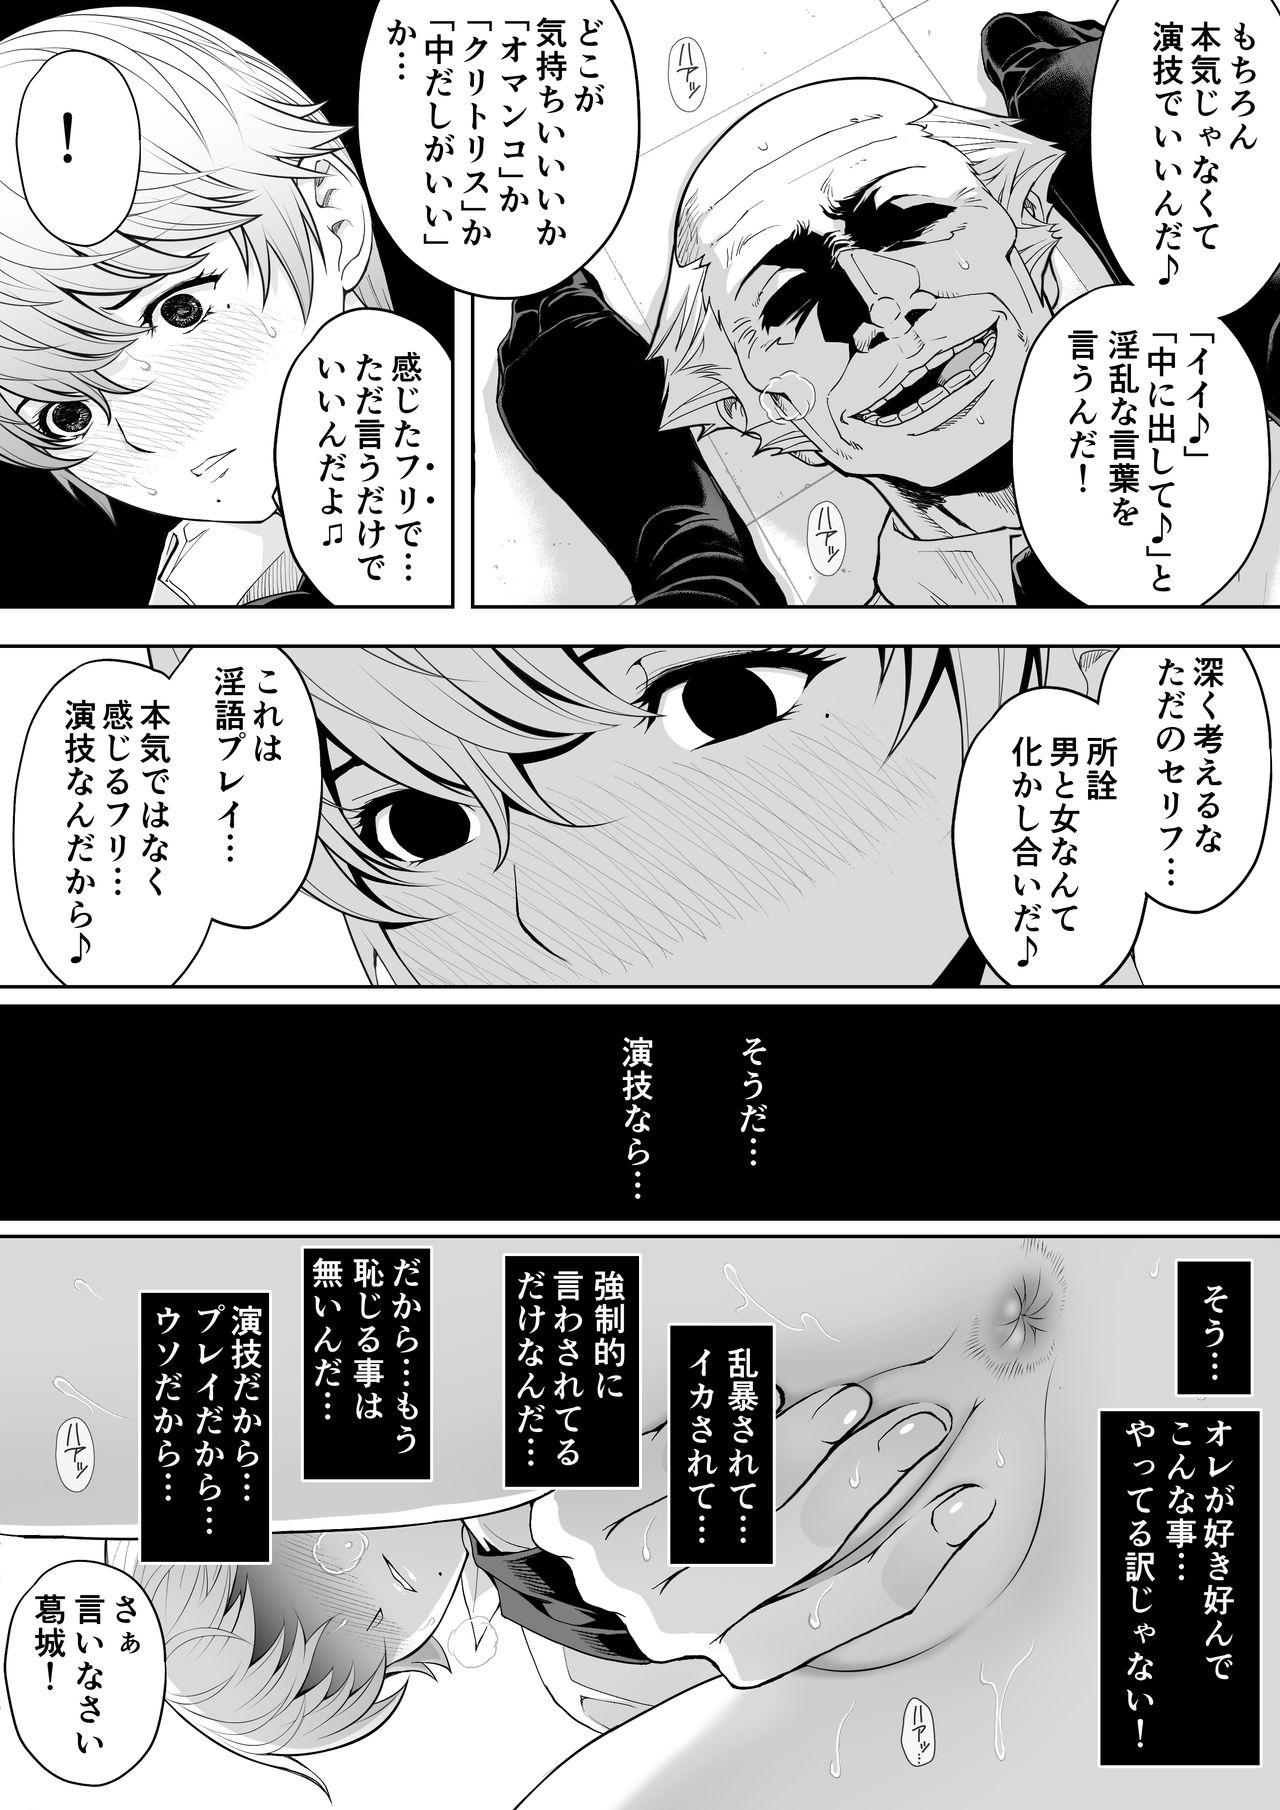 Namaiki mmusume ni tsuyo ● ikīki jugyō 63